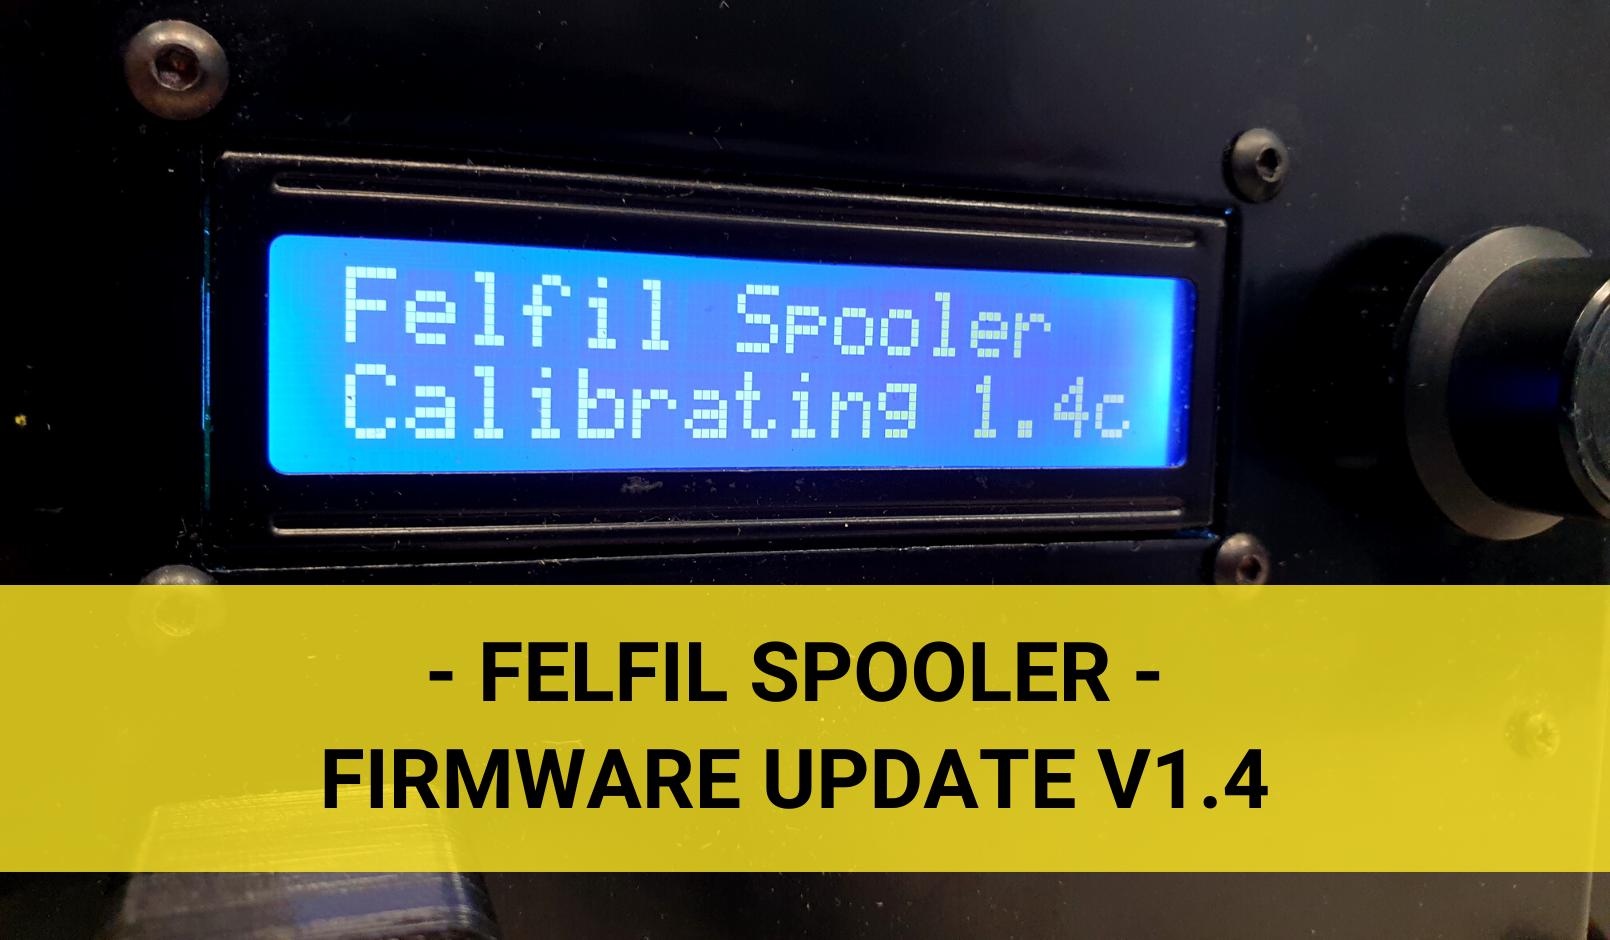 Felfil_Spooler_Update_1.4